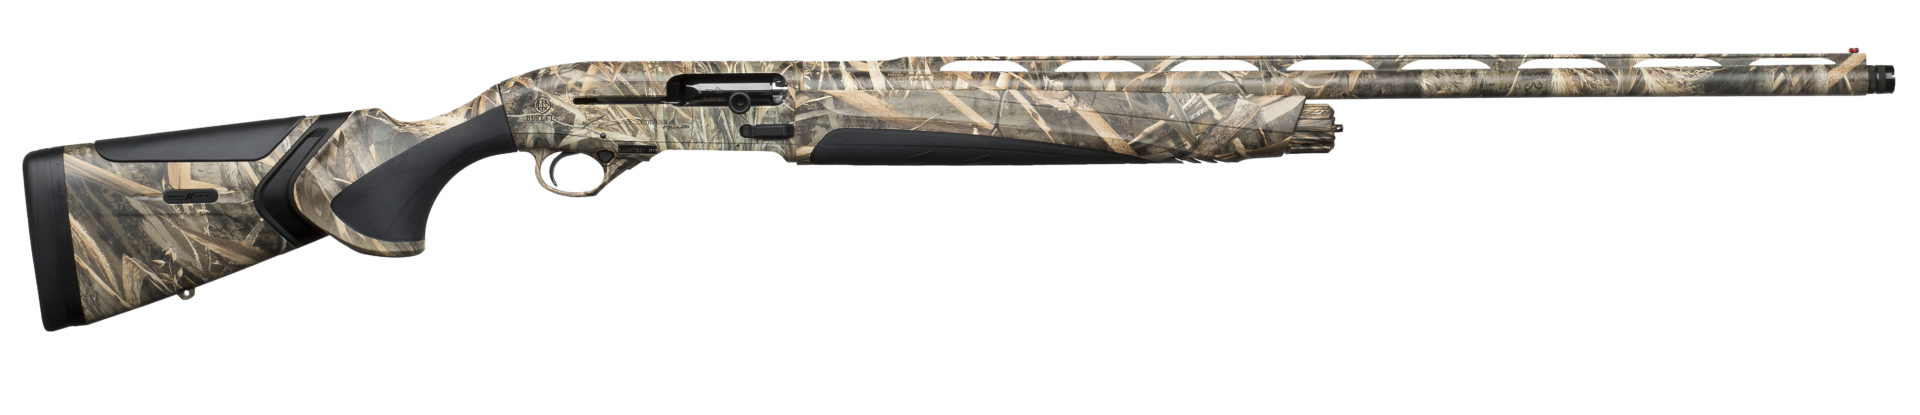 Beretta A400 Xtreme Plus shotgun.